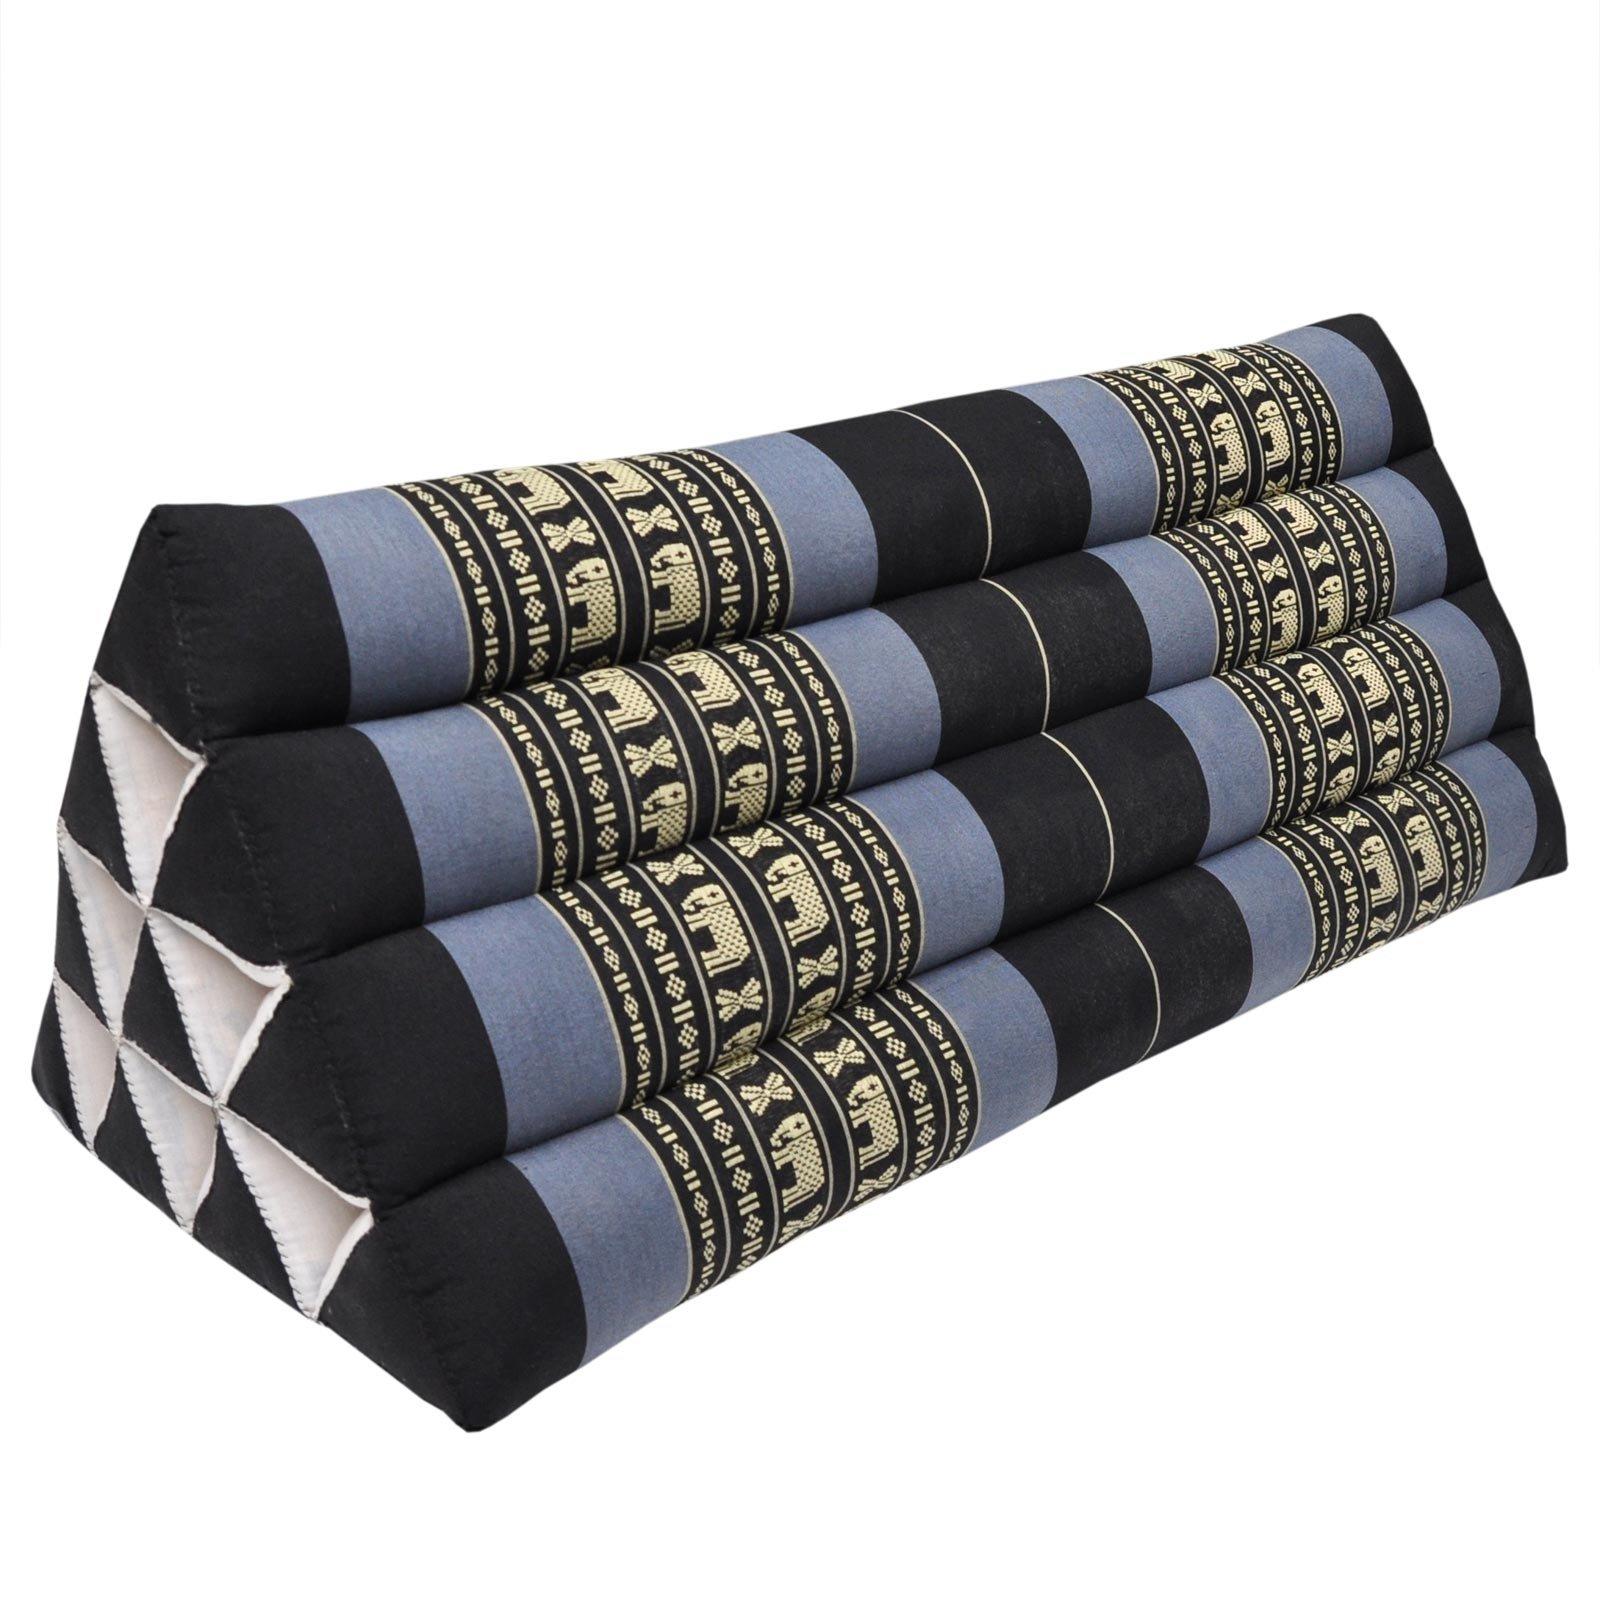 Thai triangular cushion XXL, relaxation, beach, kapok, made in Thailand Black/Violet (81315) by Wilai GmbH